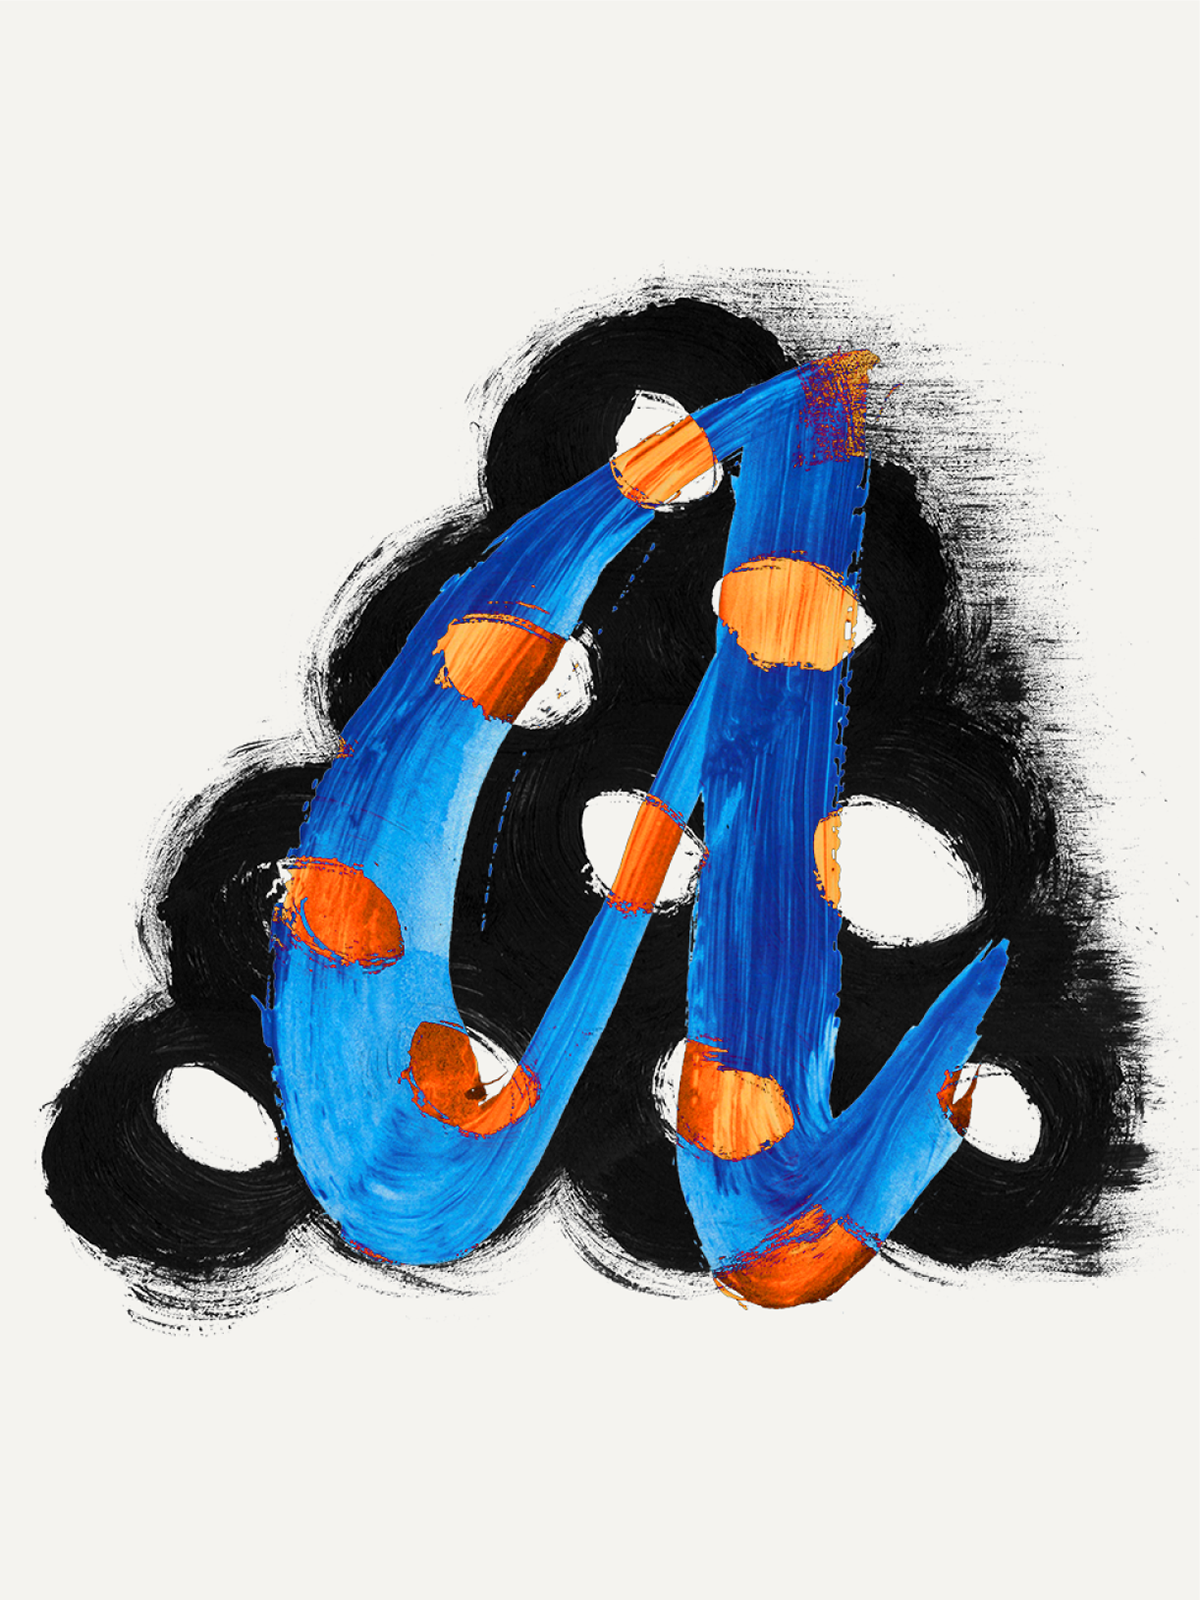 Gestalt_Multistability_FinalPoster-01.png